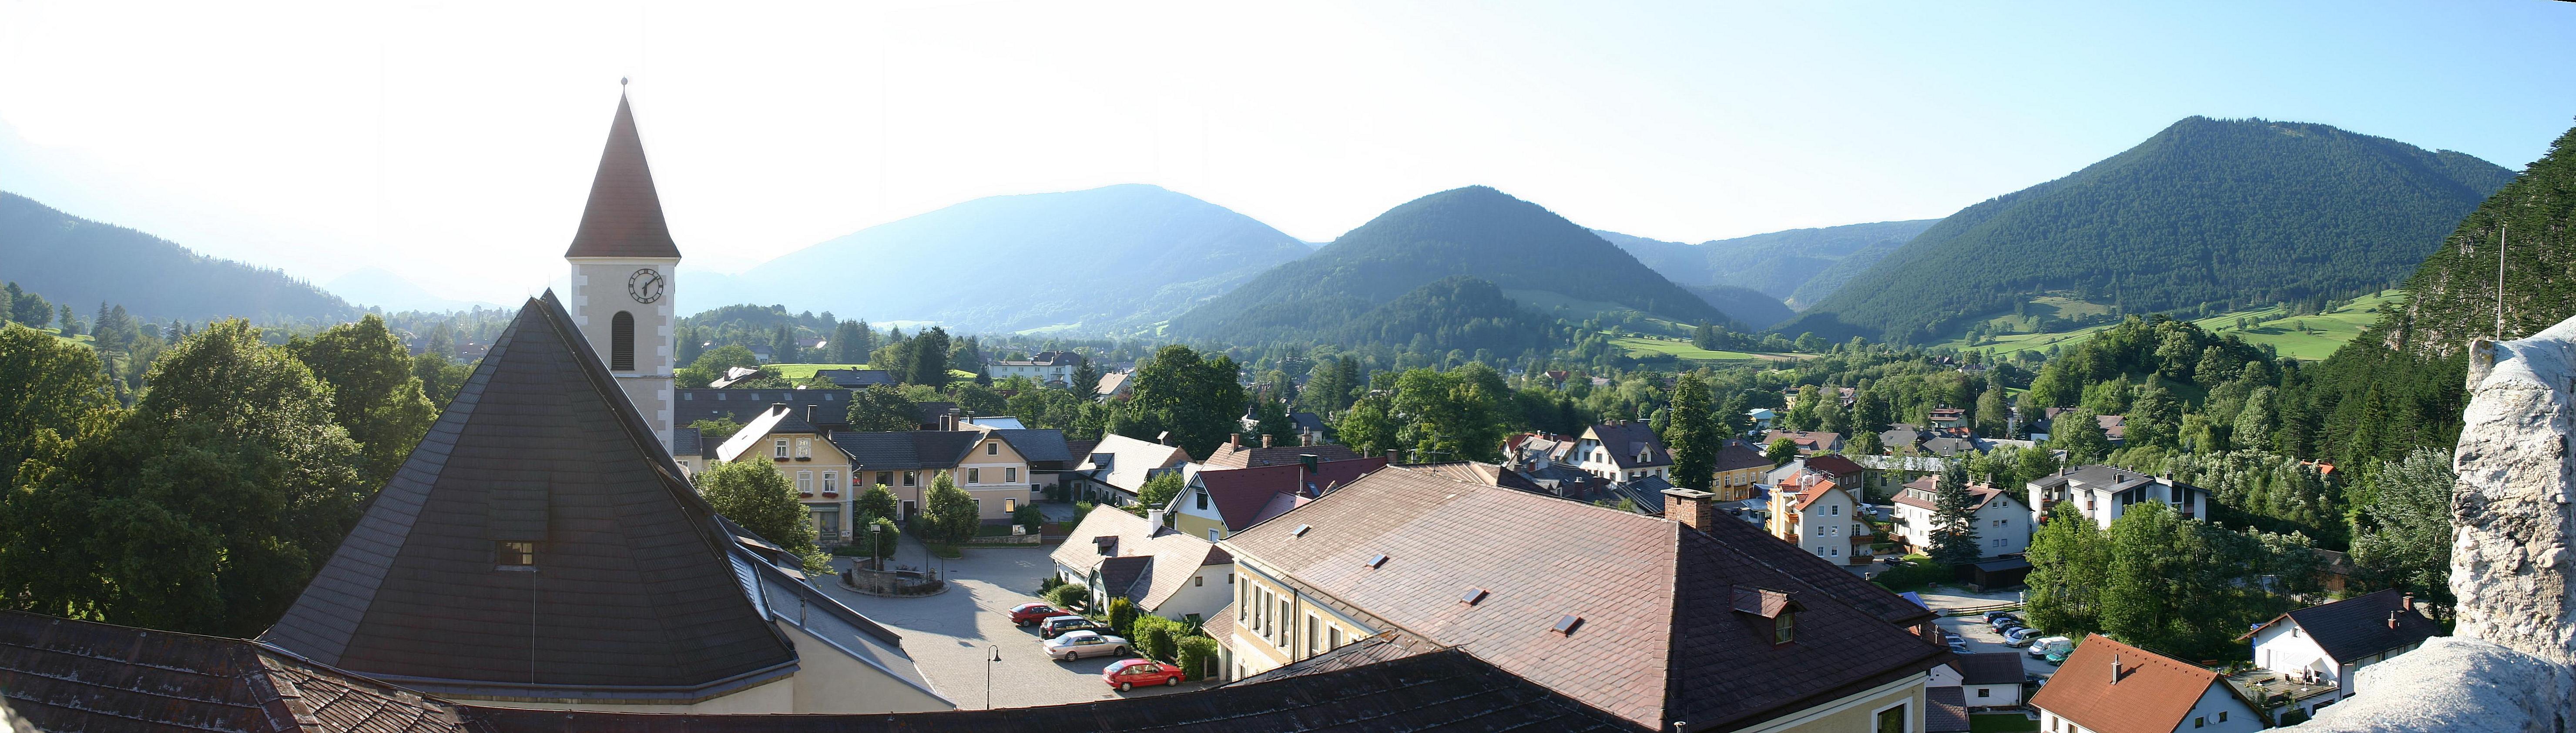 Puchberg am Schneeberg Panorama.jpg